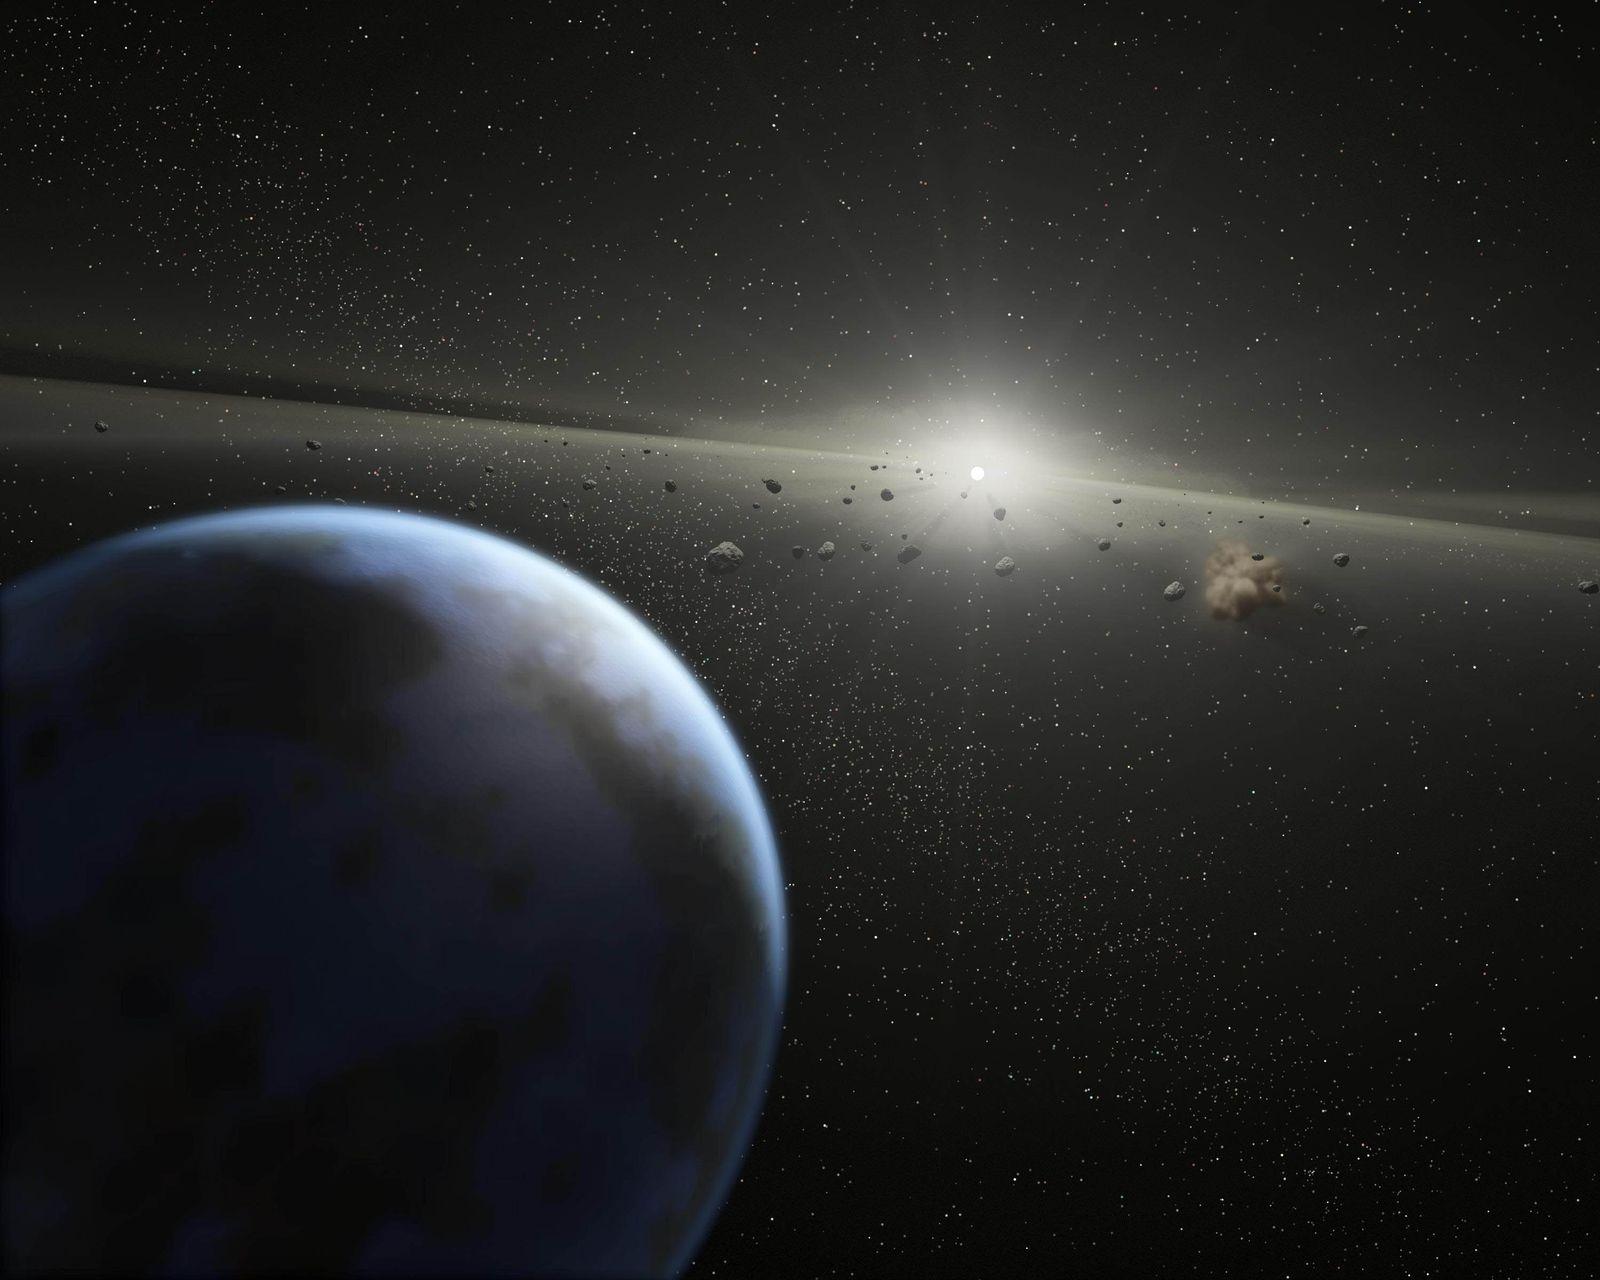 Asteroidengürtel / Asteroid